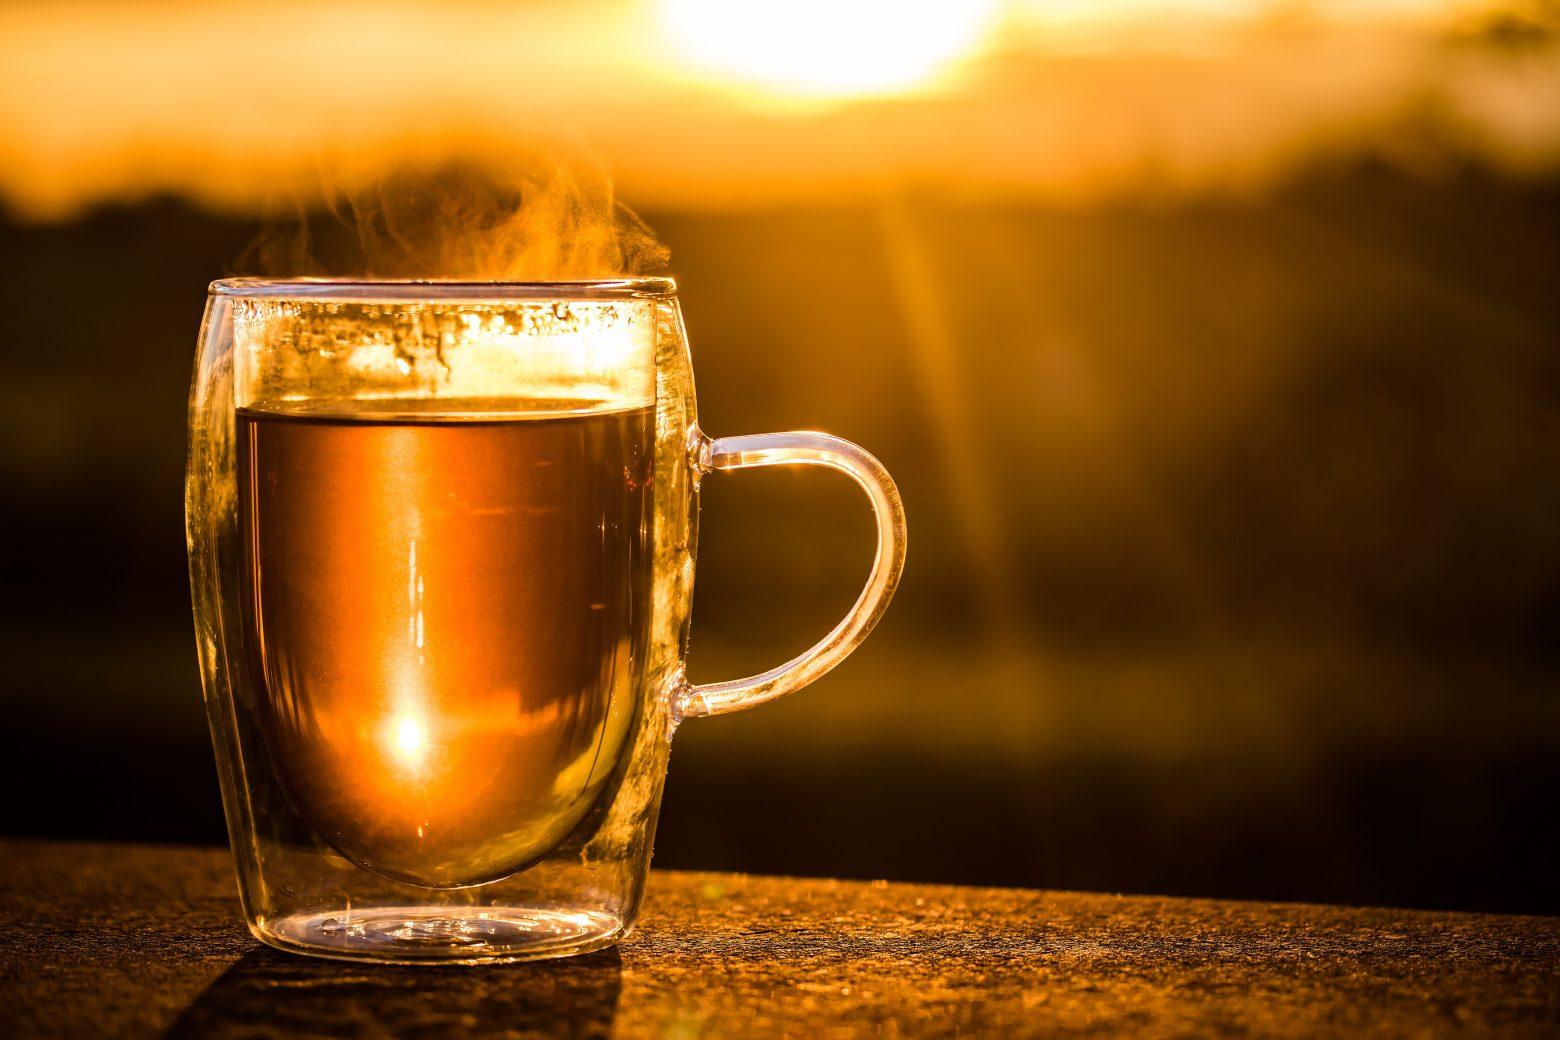 teacup-2324842